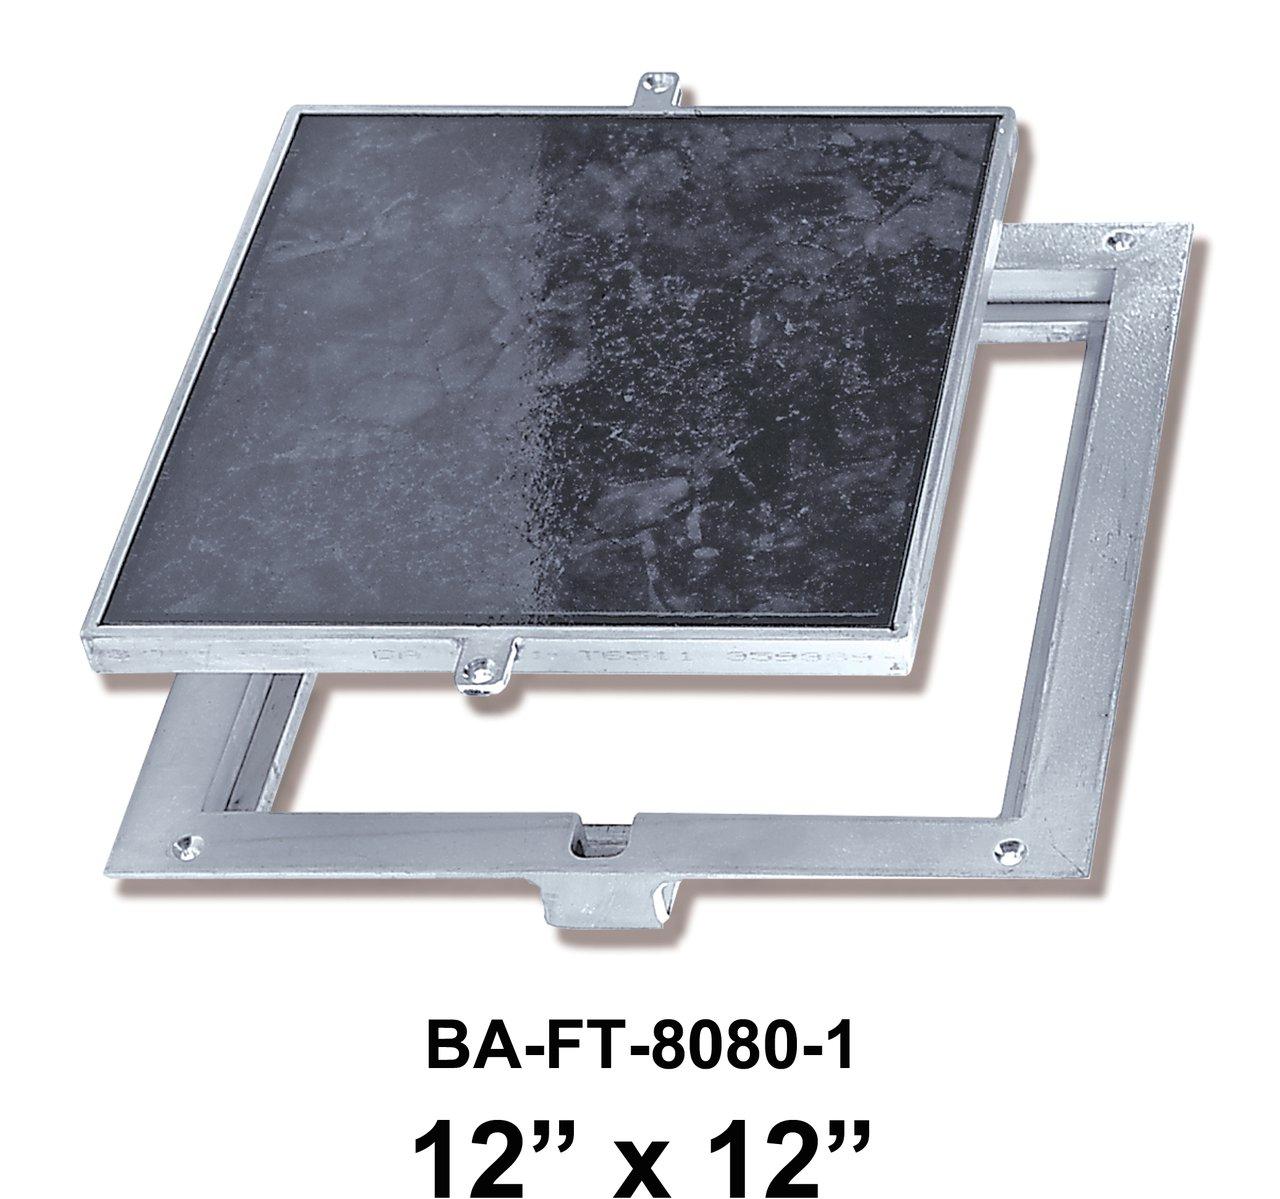 12'' x 12'' Removeable Floor Door - 1'' Recess for Ceramic Tile / Concrete